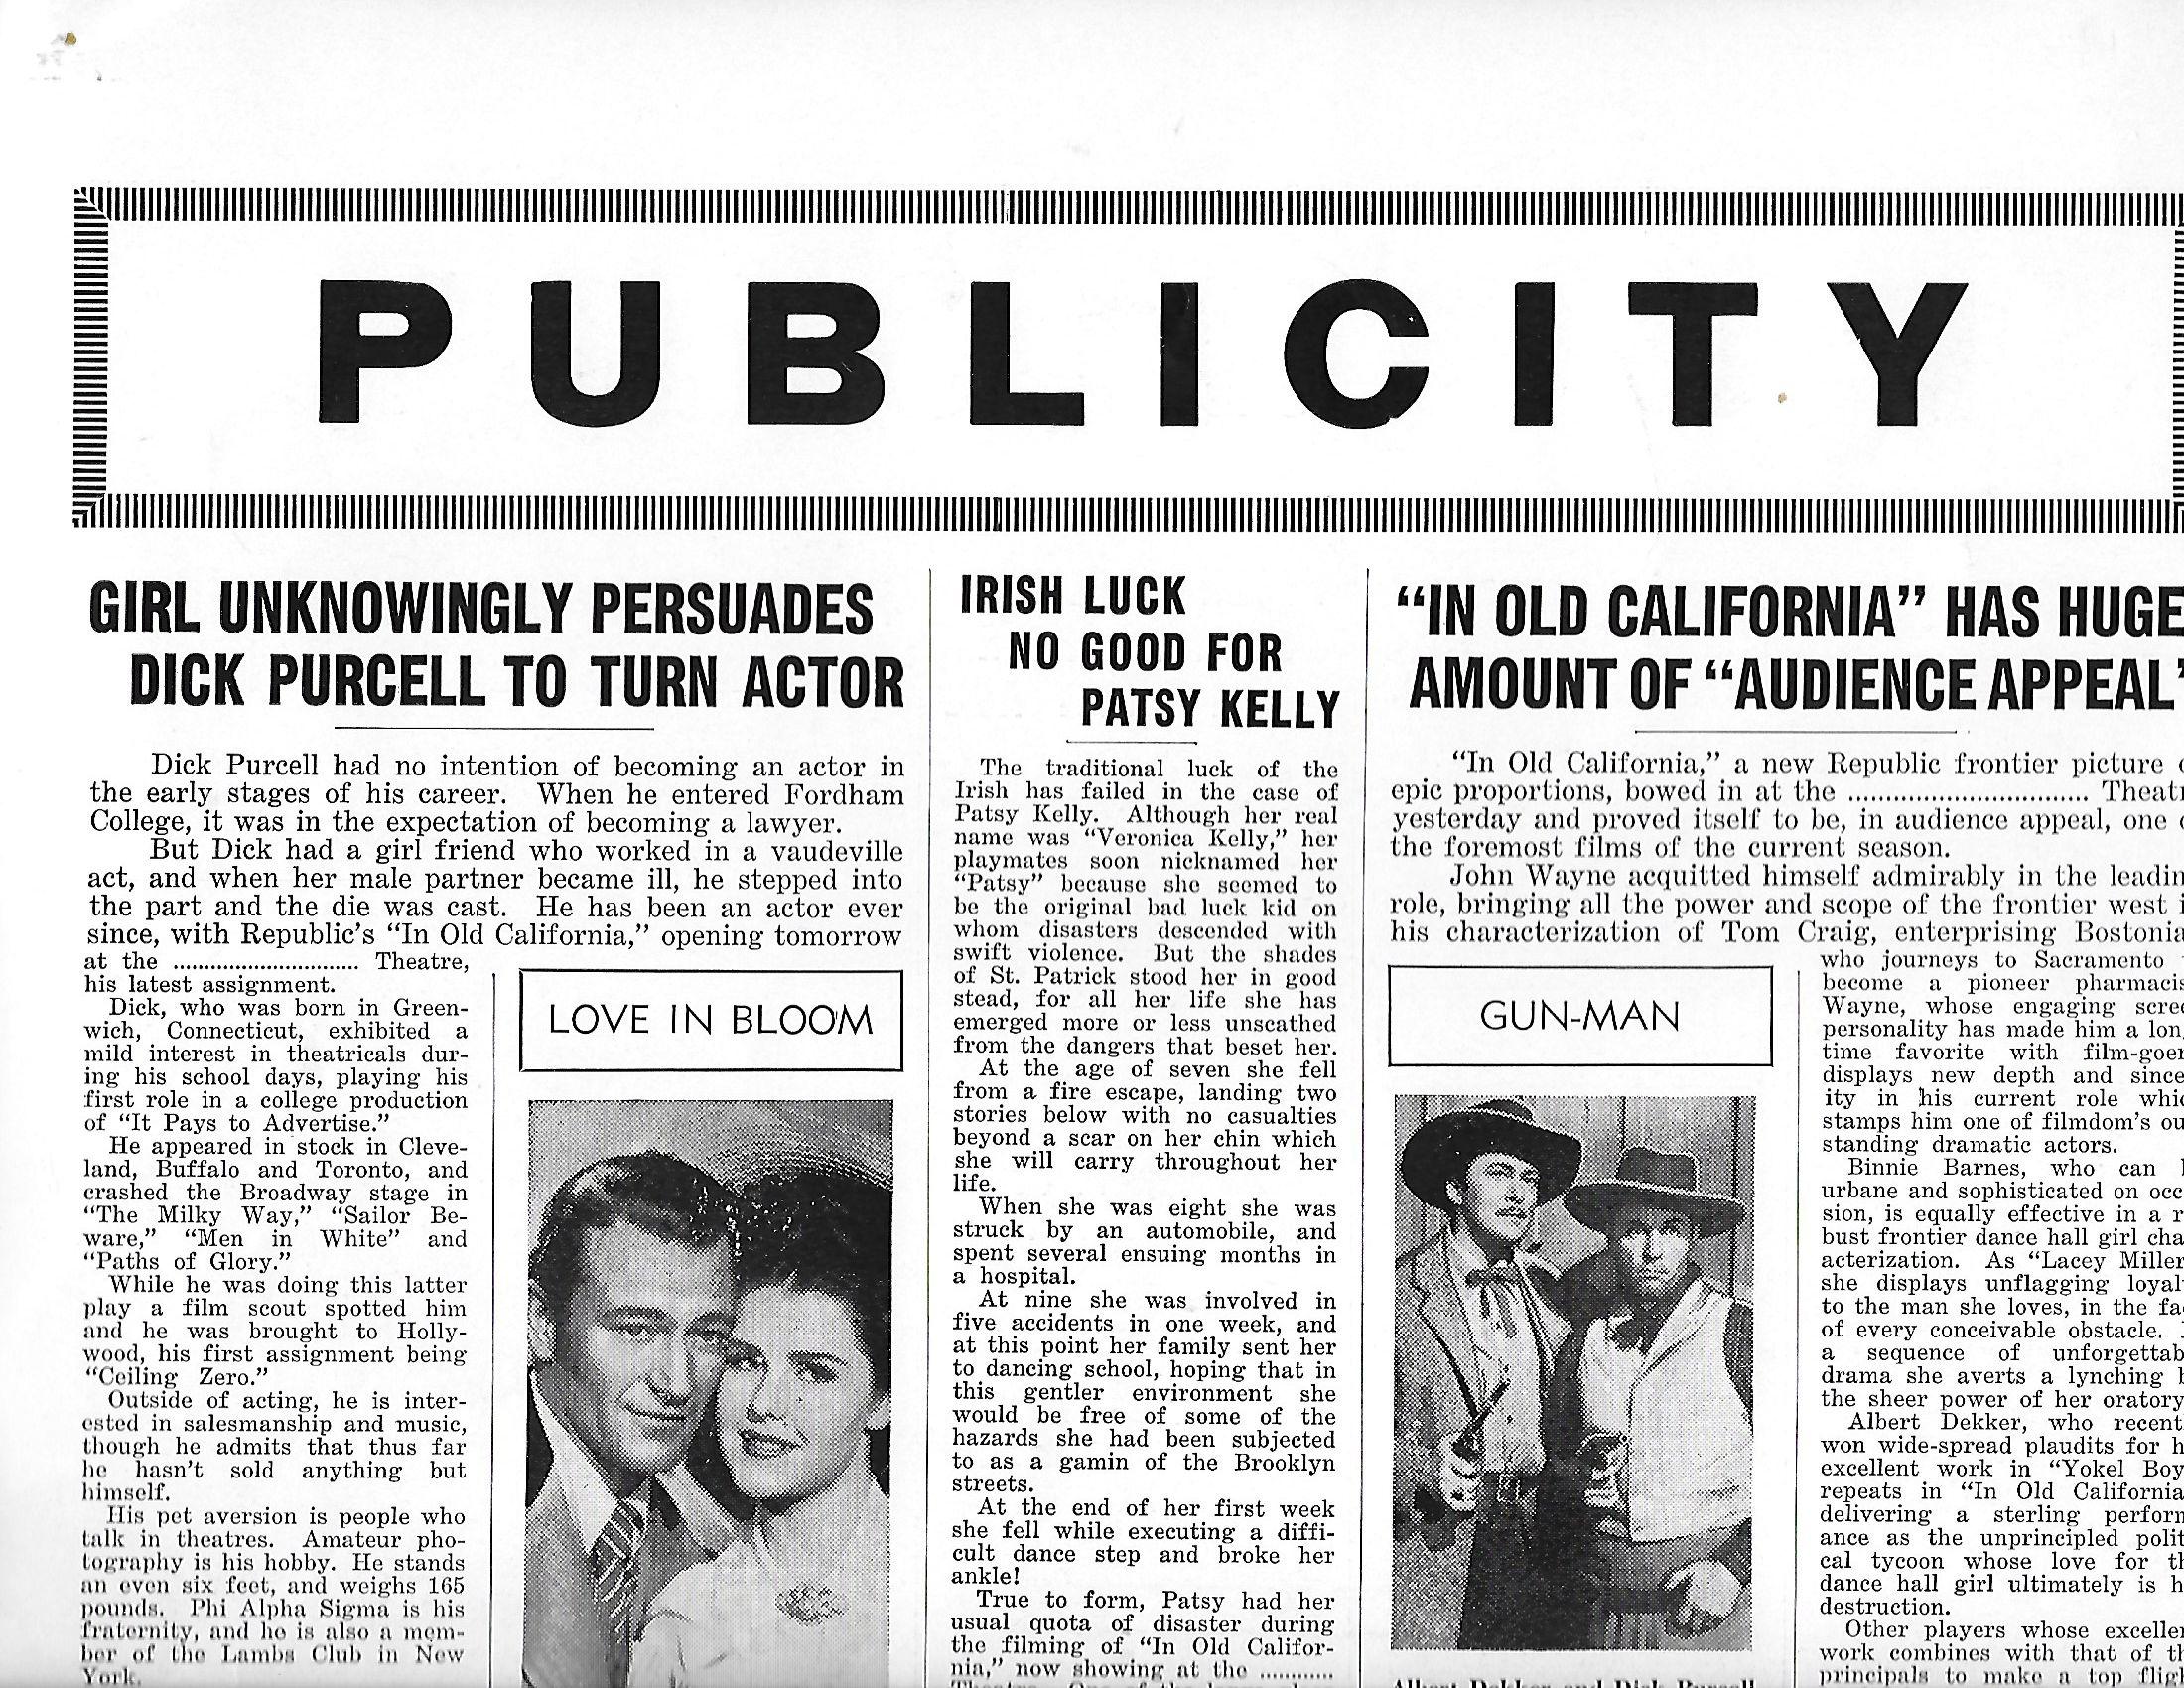 John Wayne, Albert Dekker, Helen Parrish, and Dick Purcell in In Old California (1942)